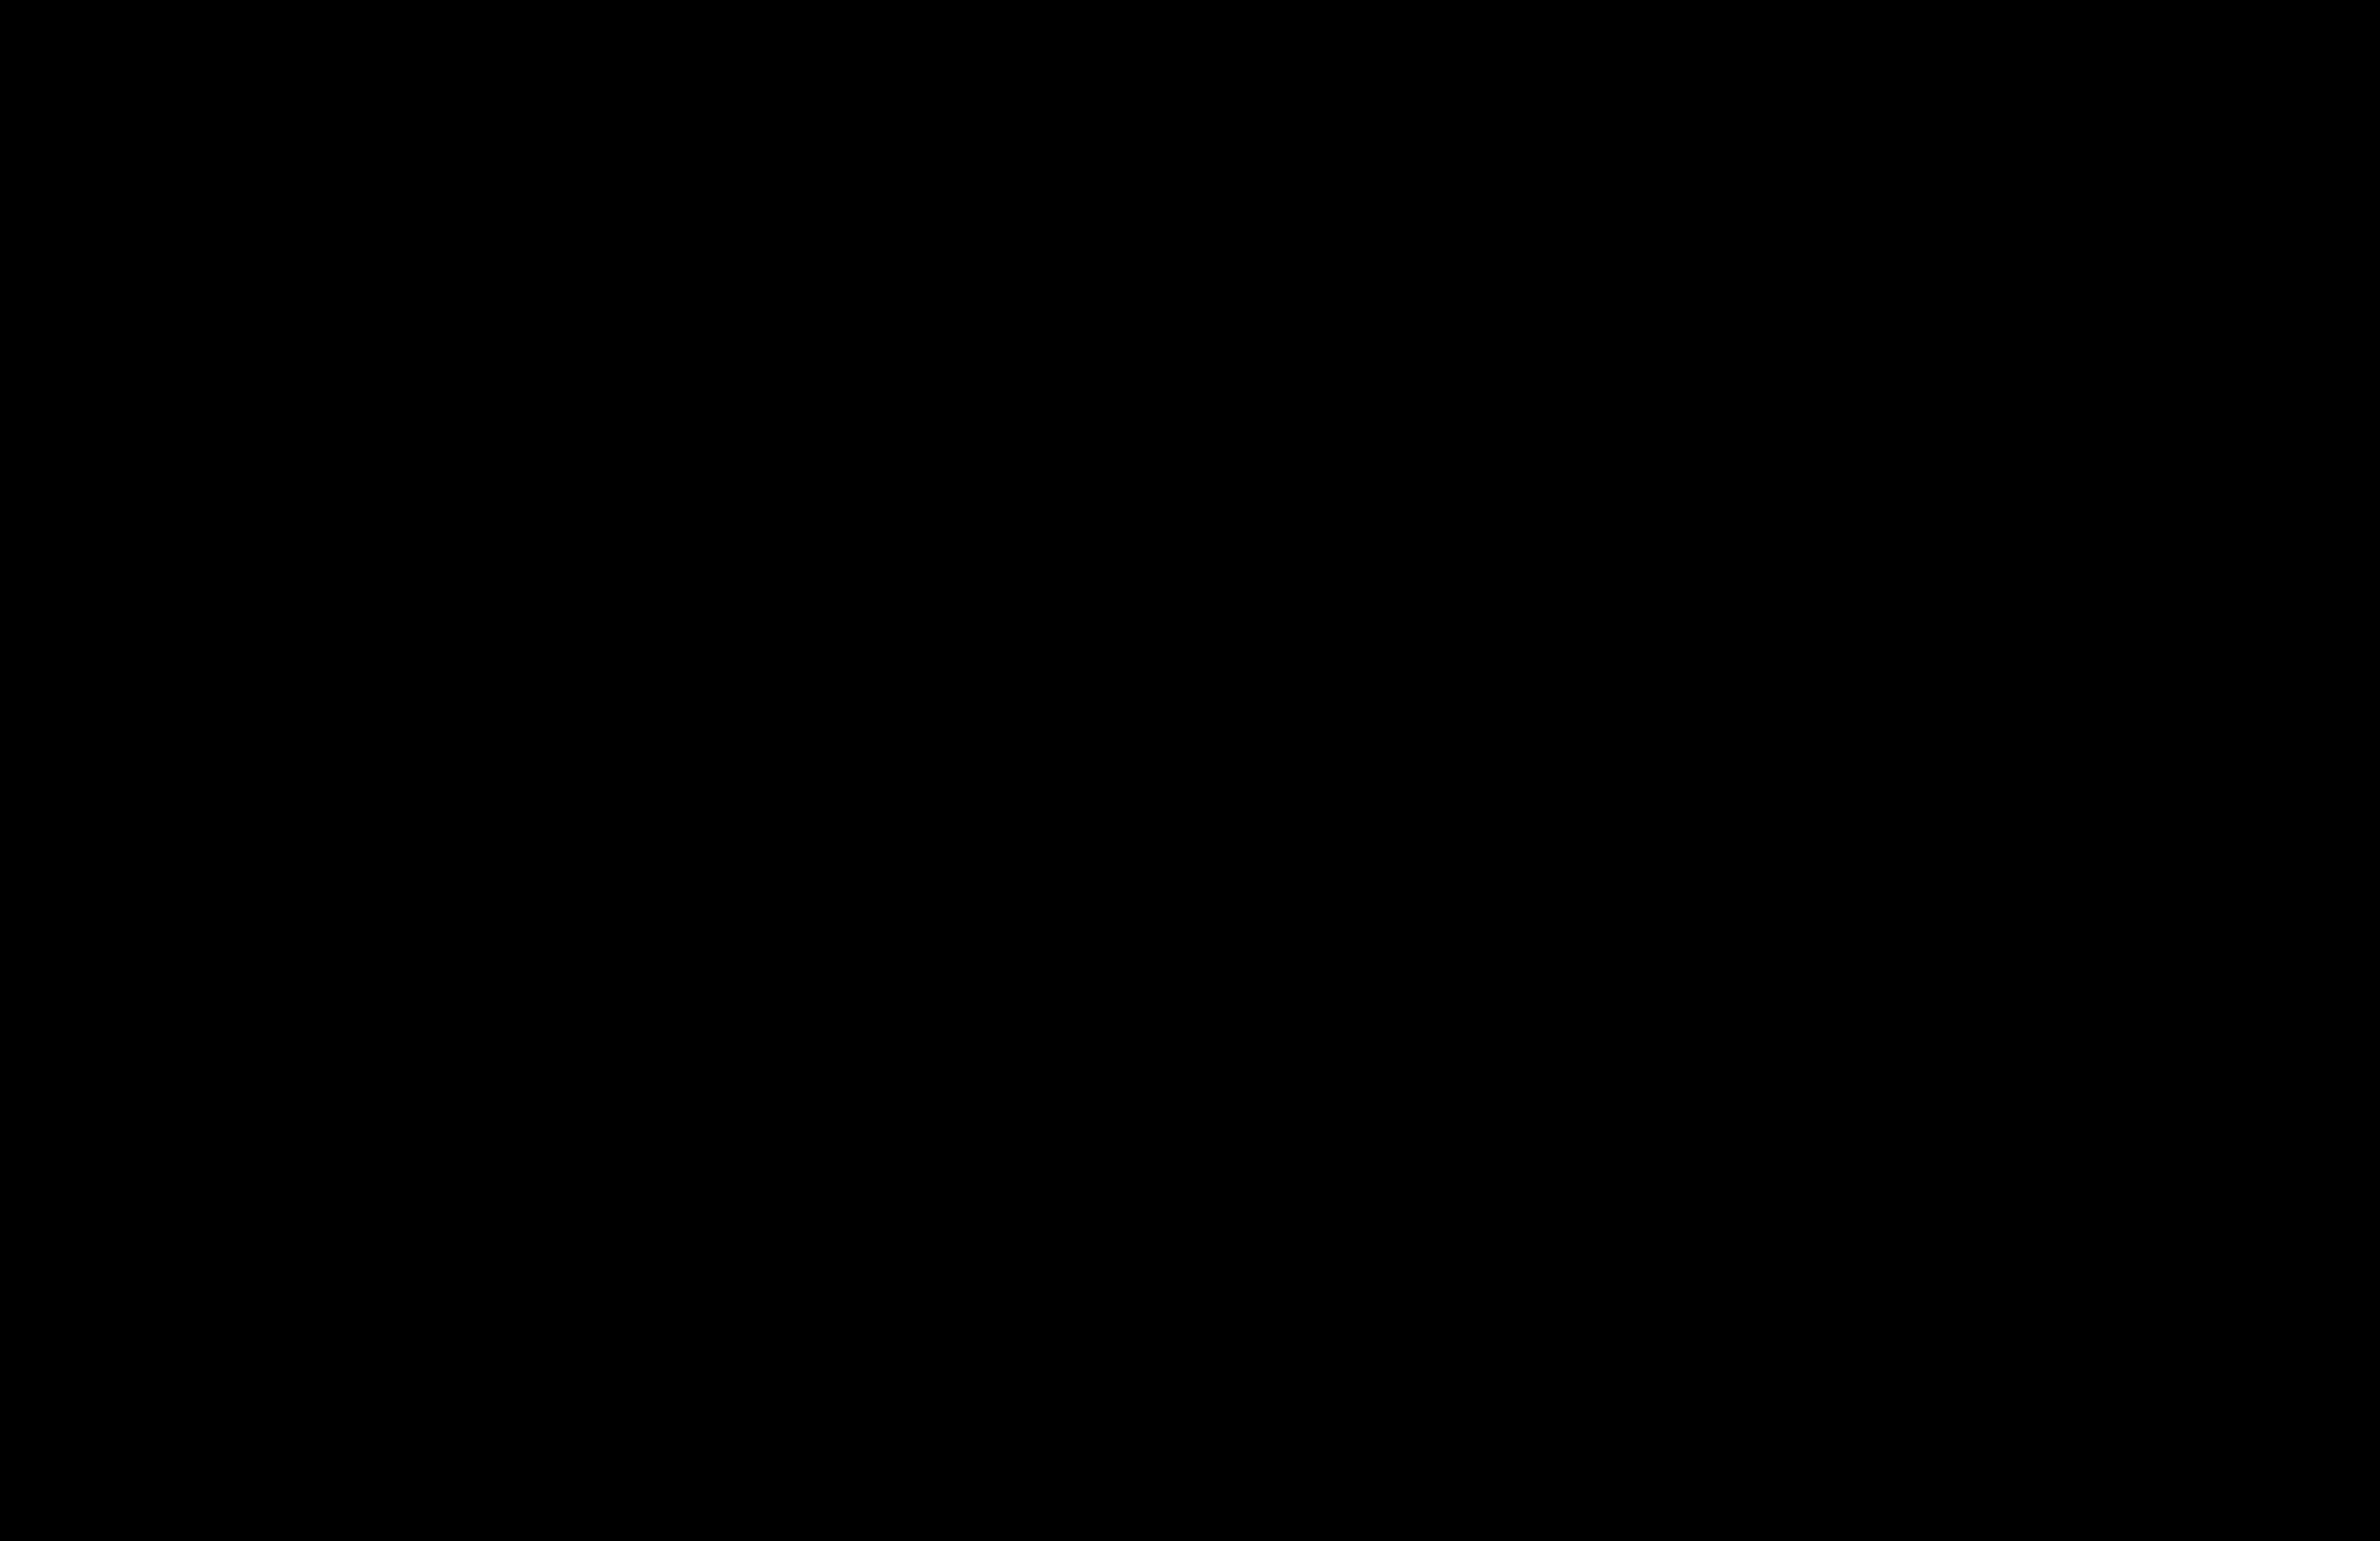 Clipart  Jack'olantern Stencil